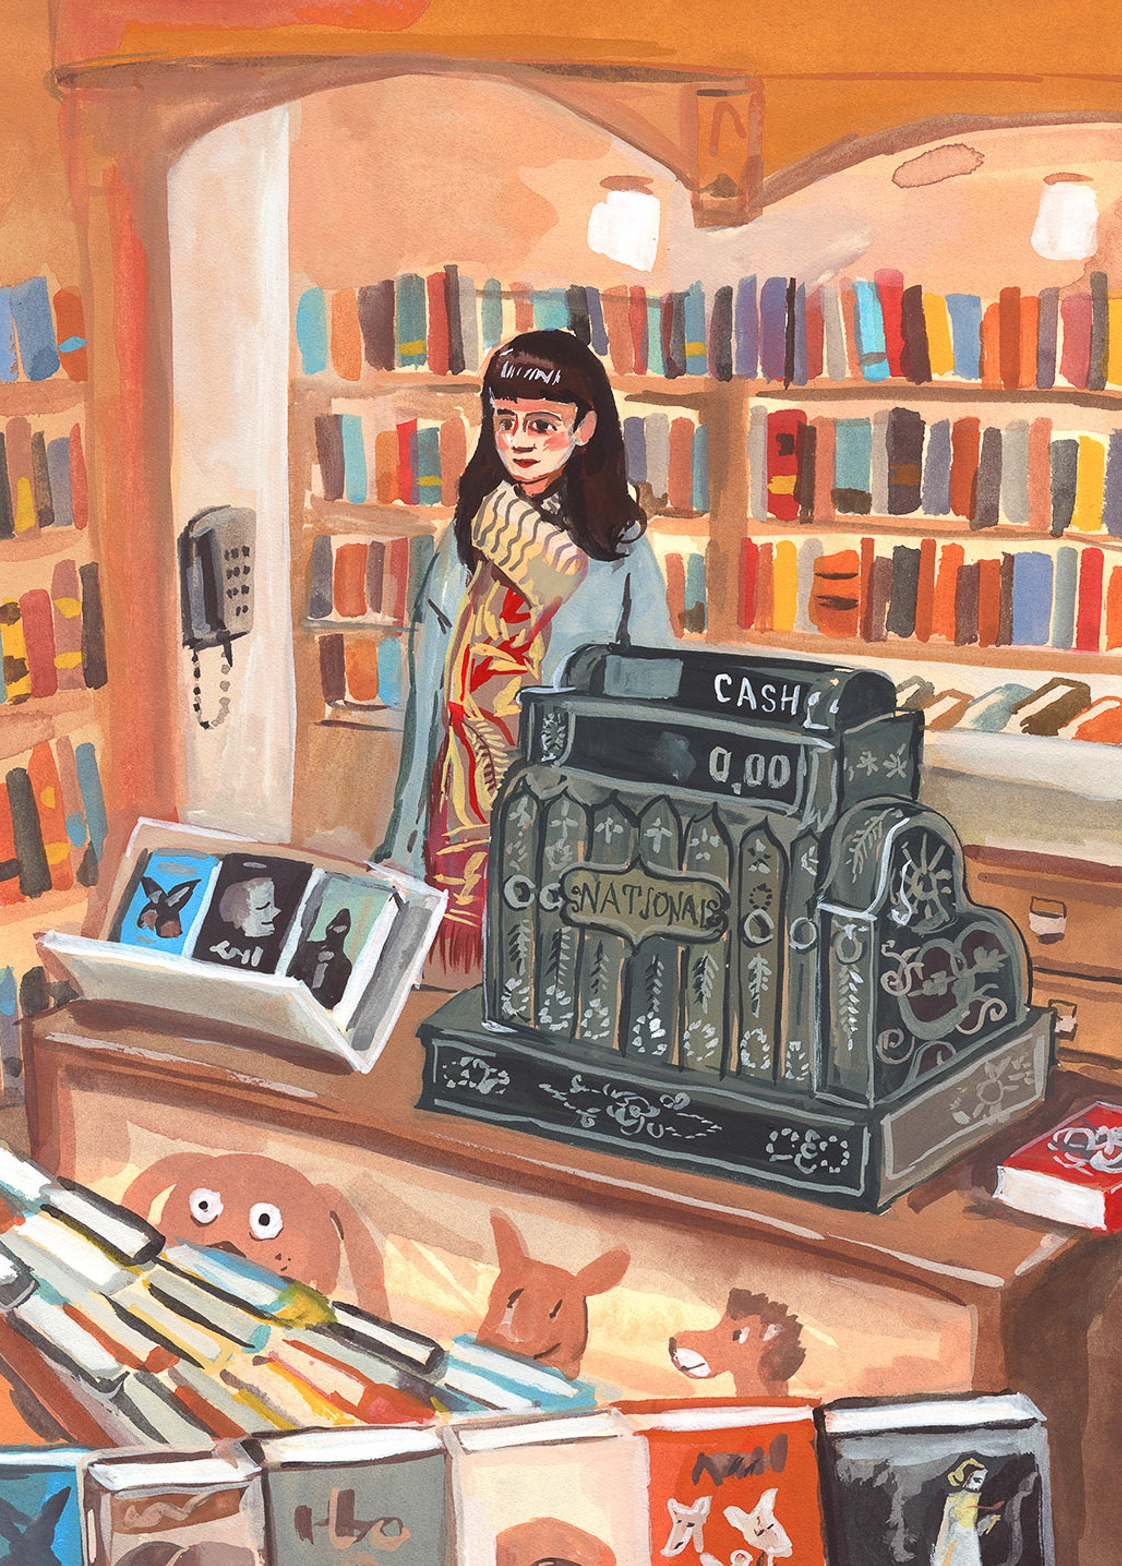 CA 60 2019, SOI 61 2018 - ARTIST: Jenny KroikTITLE: Corner Bookstore [Series, 2 of 7]